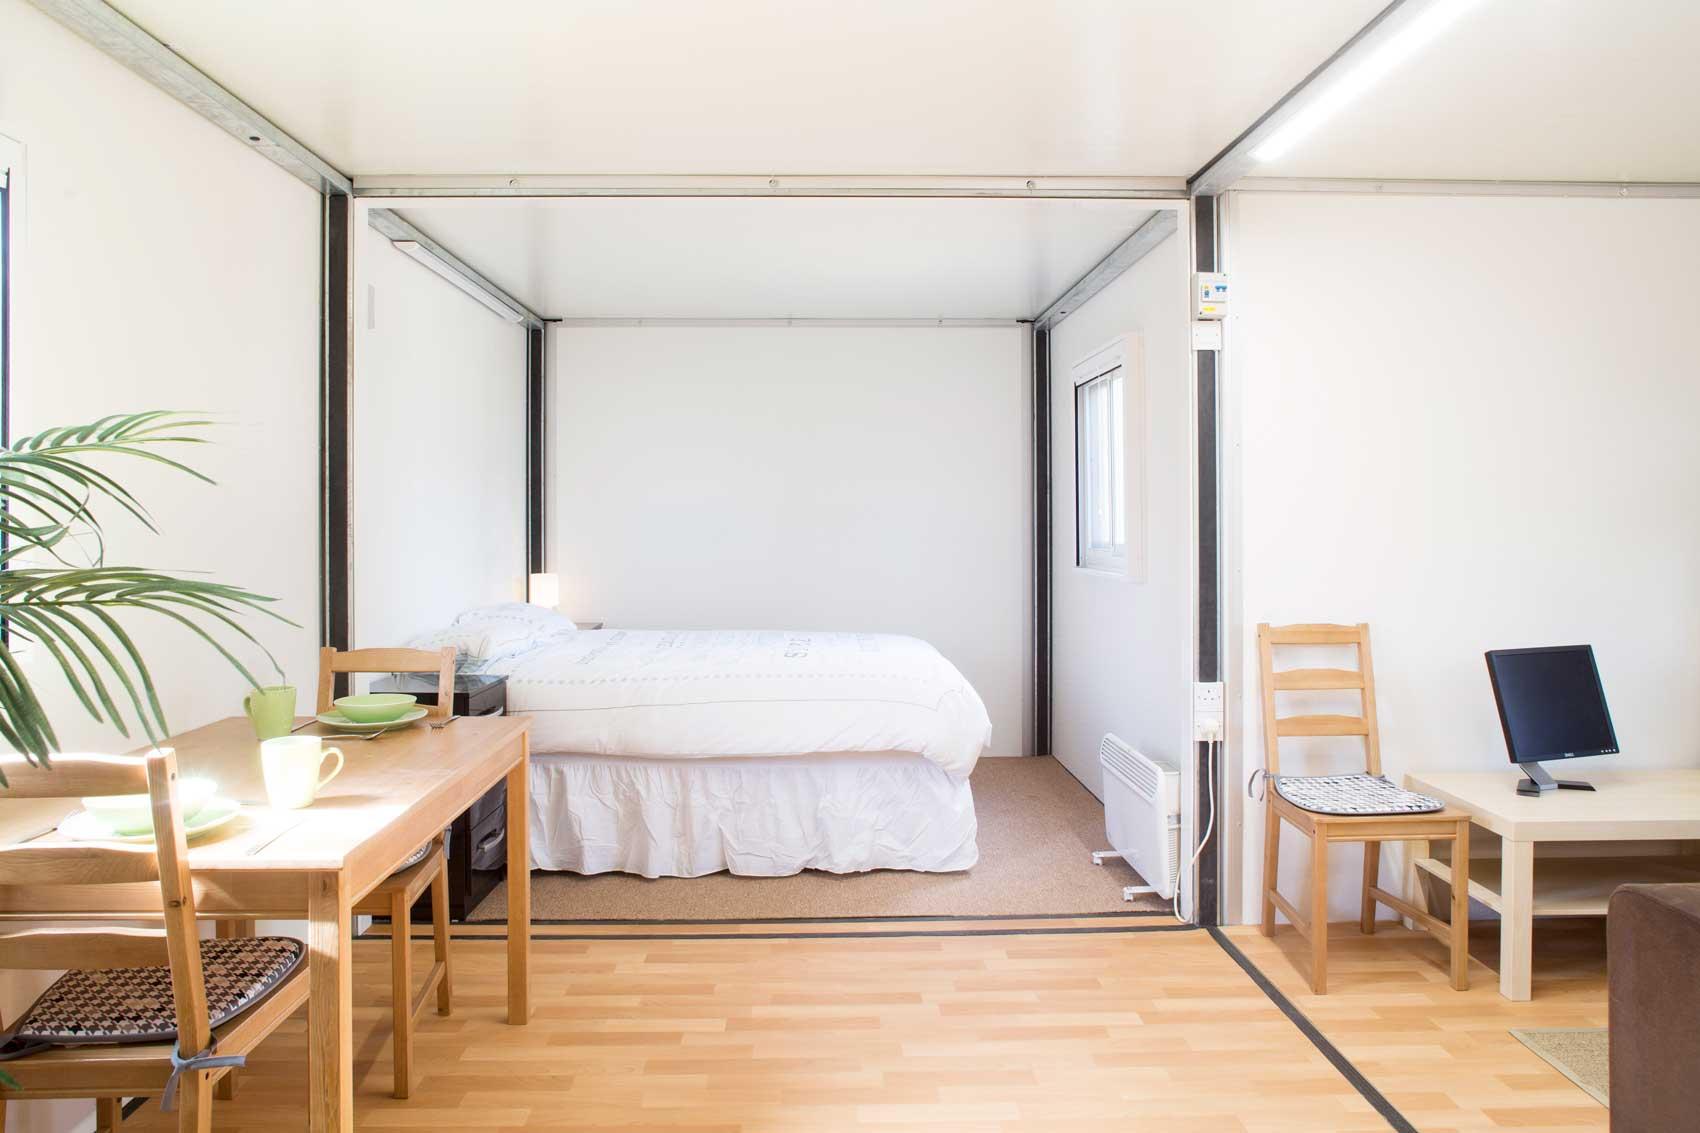 Cocoon Project Kudos Modular Housing 1.jpg